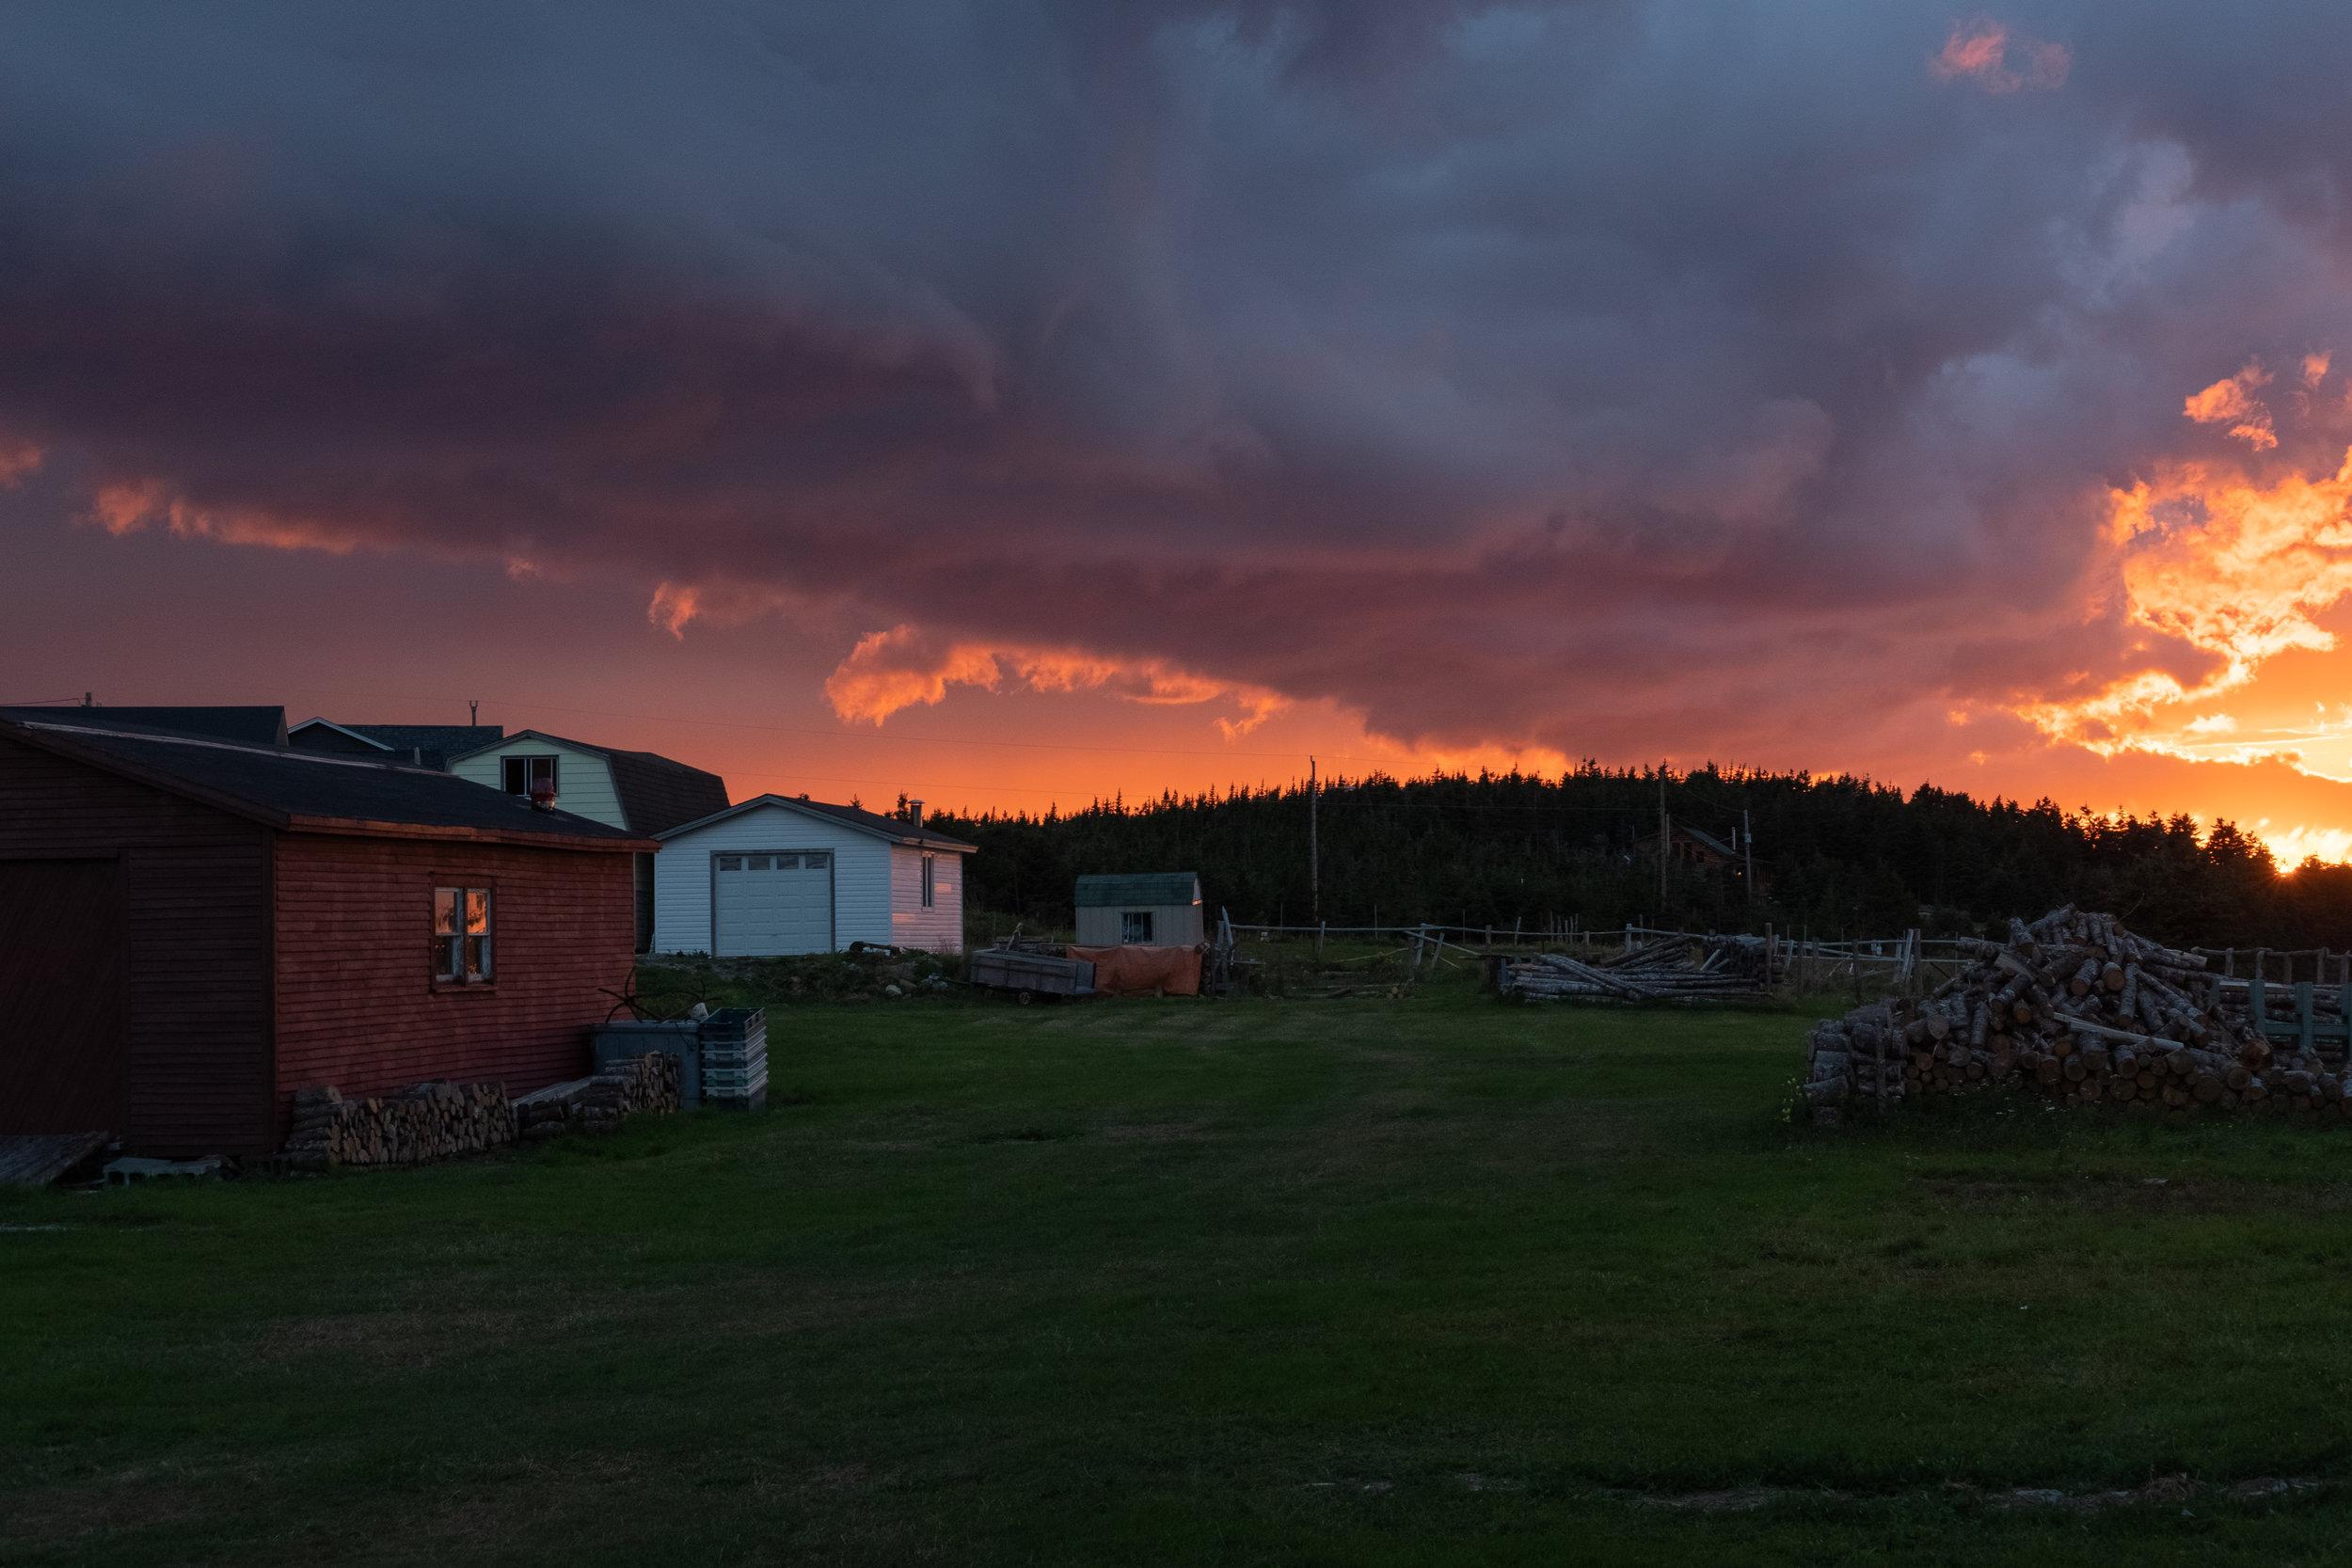 Heart's Delight-Islington Newfoundland September 7th-8th, 2018 -